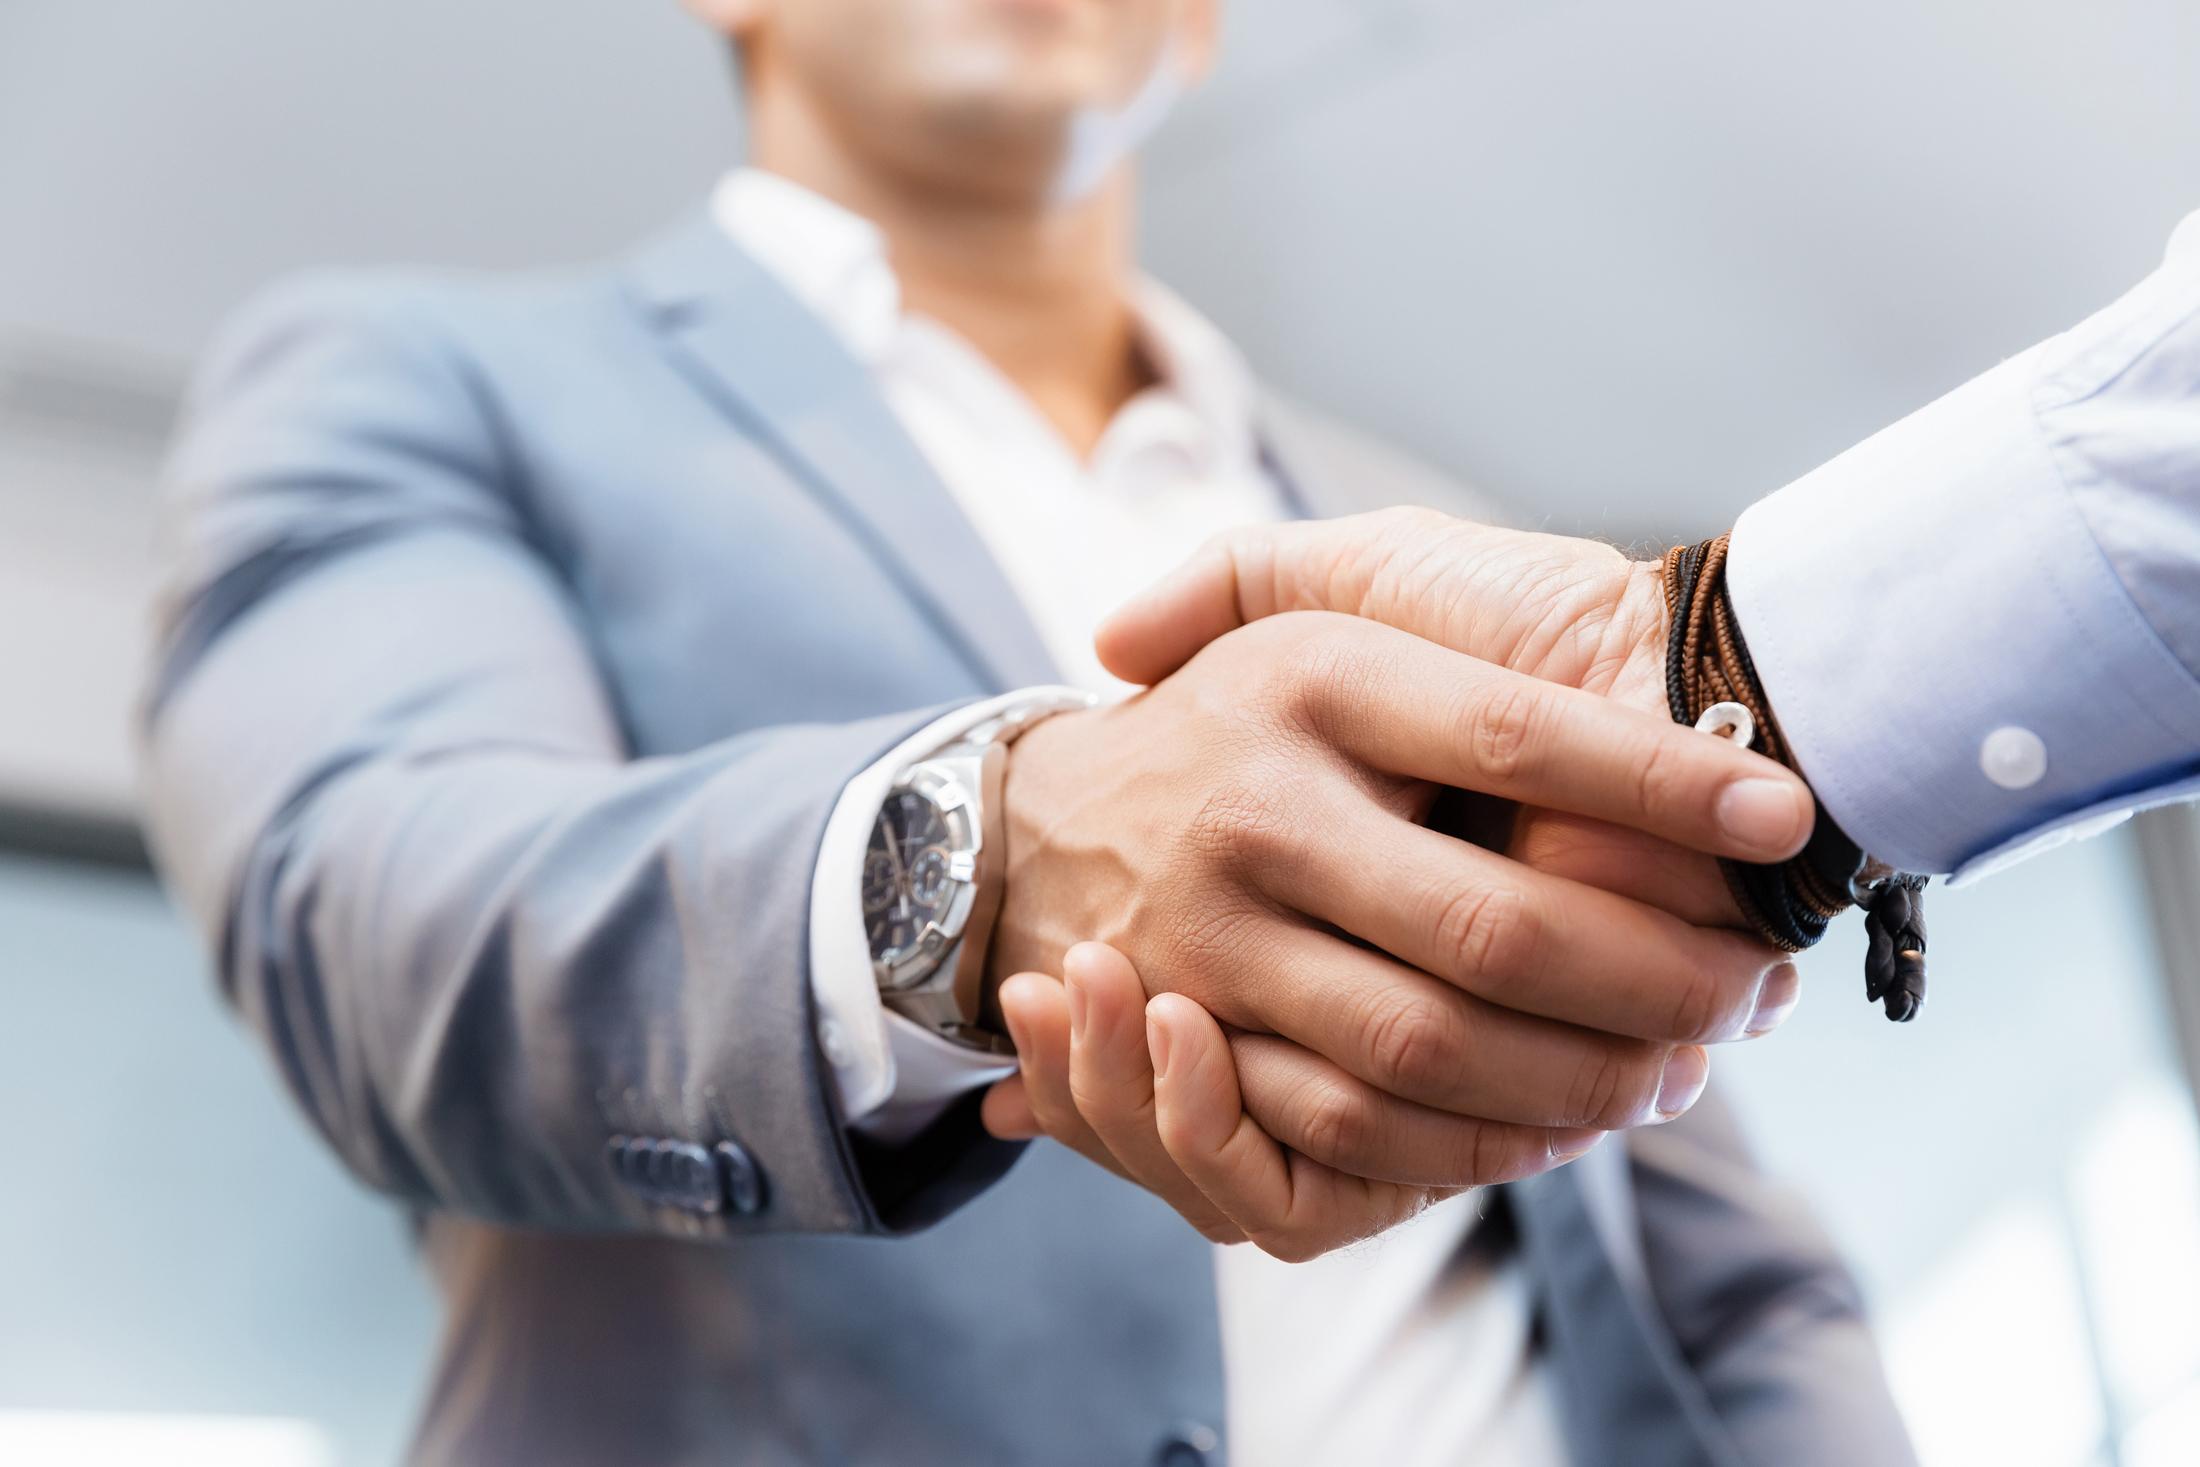 Handshake of businessmen greeting each other